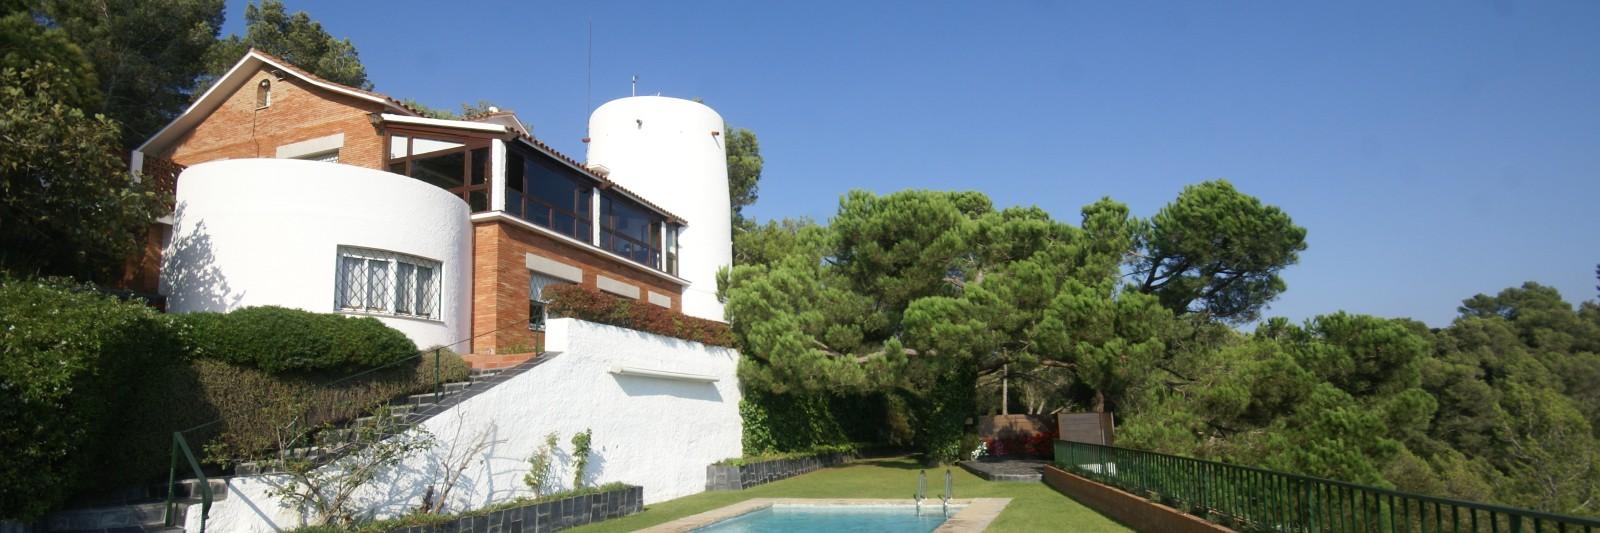 MG Inmobiliaria Sant CUgat - casa-vallvidrera